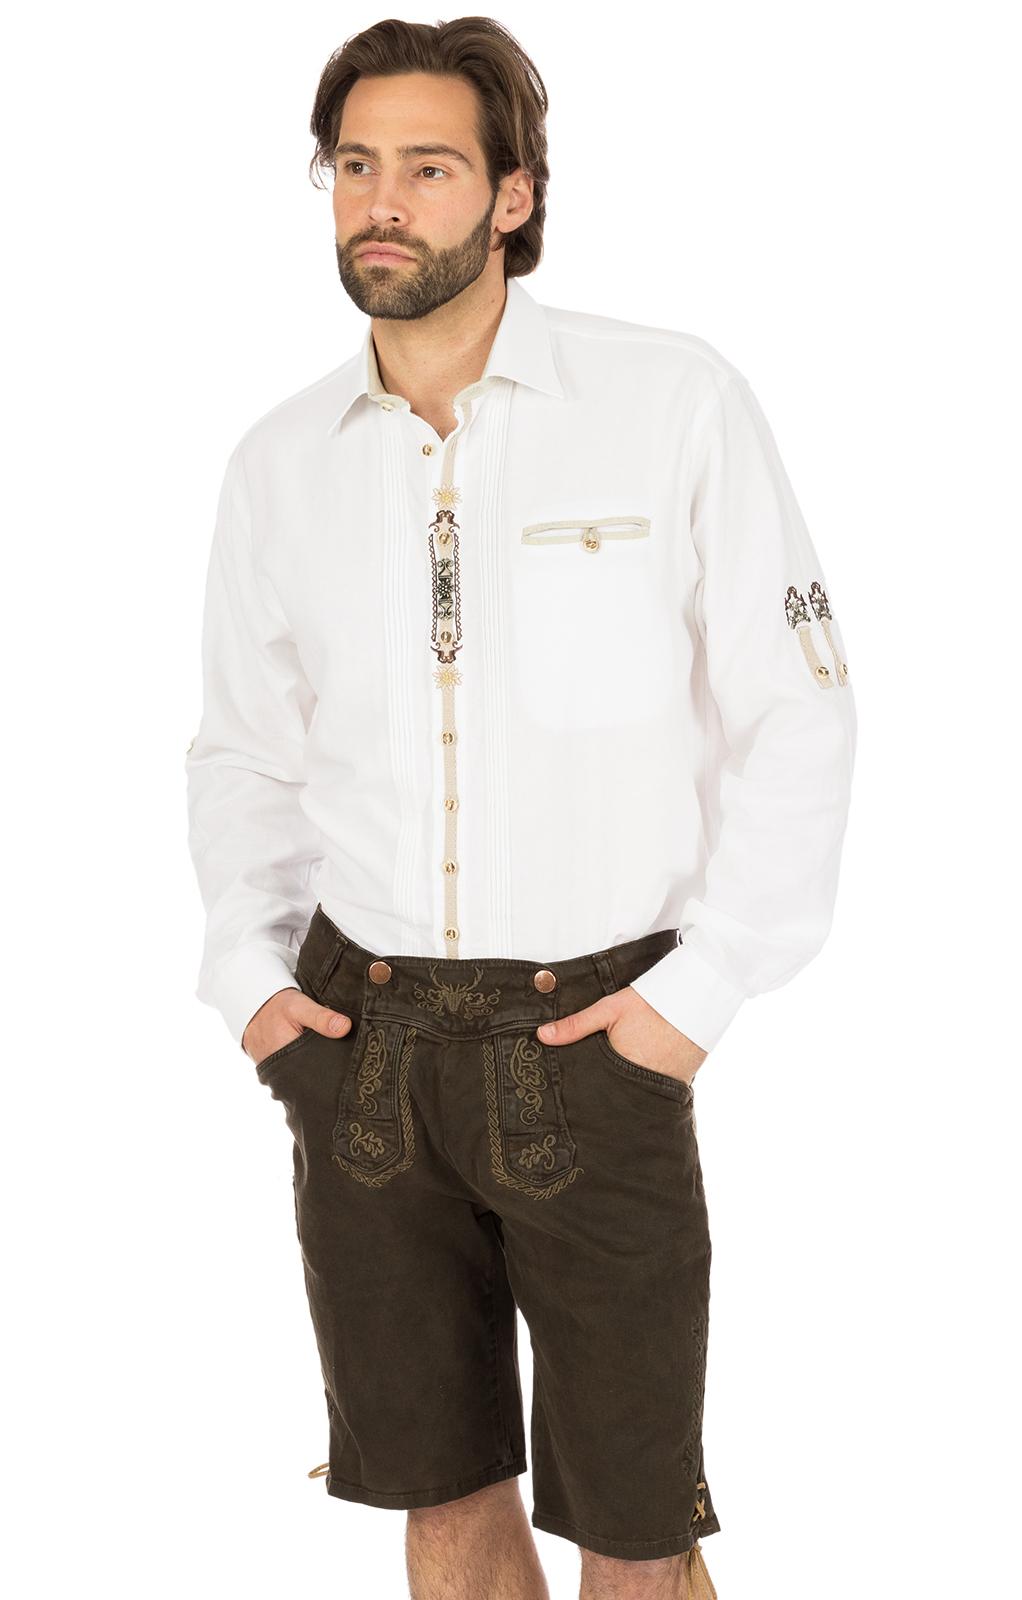 Tiroler korte jeanshort bruin von Hangowear